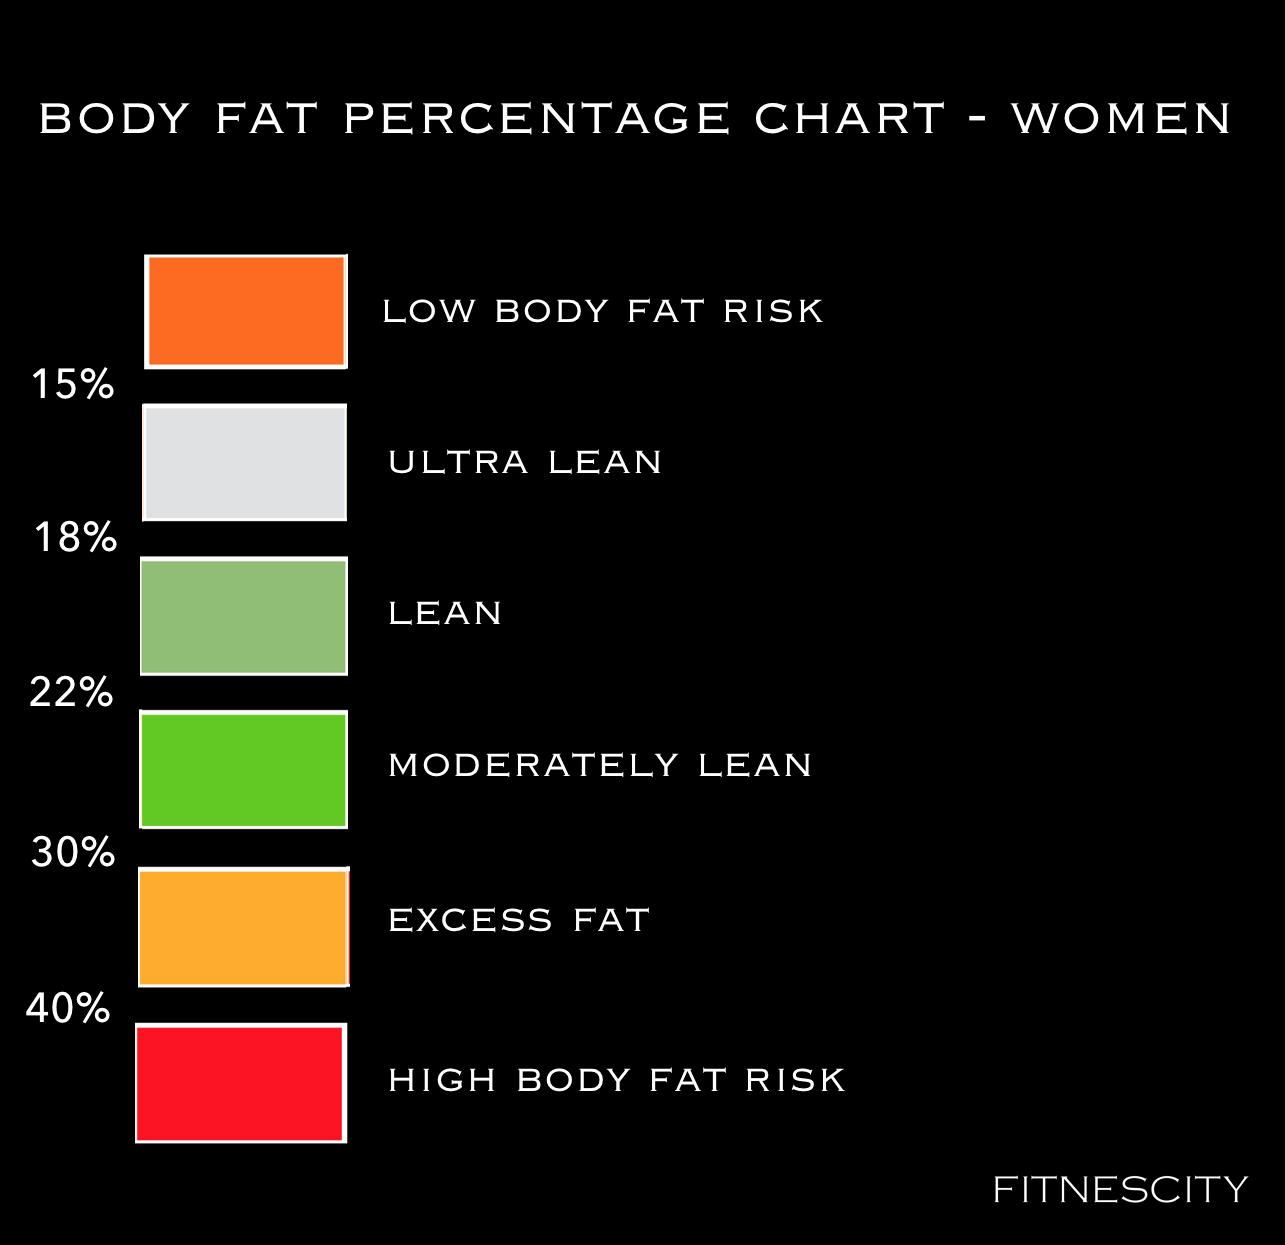 FITNESCITY - BODY FAT CLASSIFICATION FOR WOMEN - SQ.png